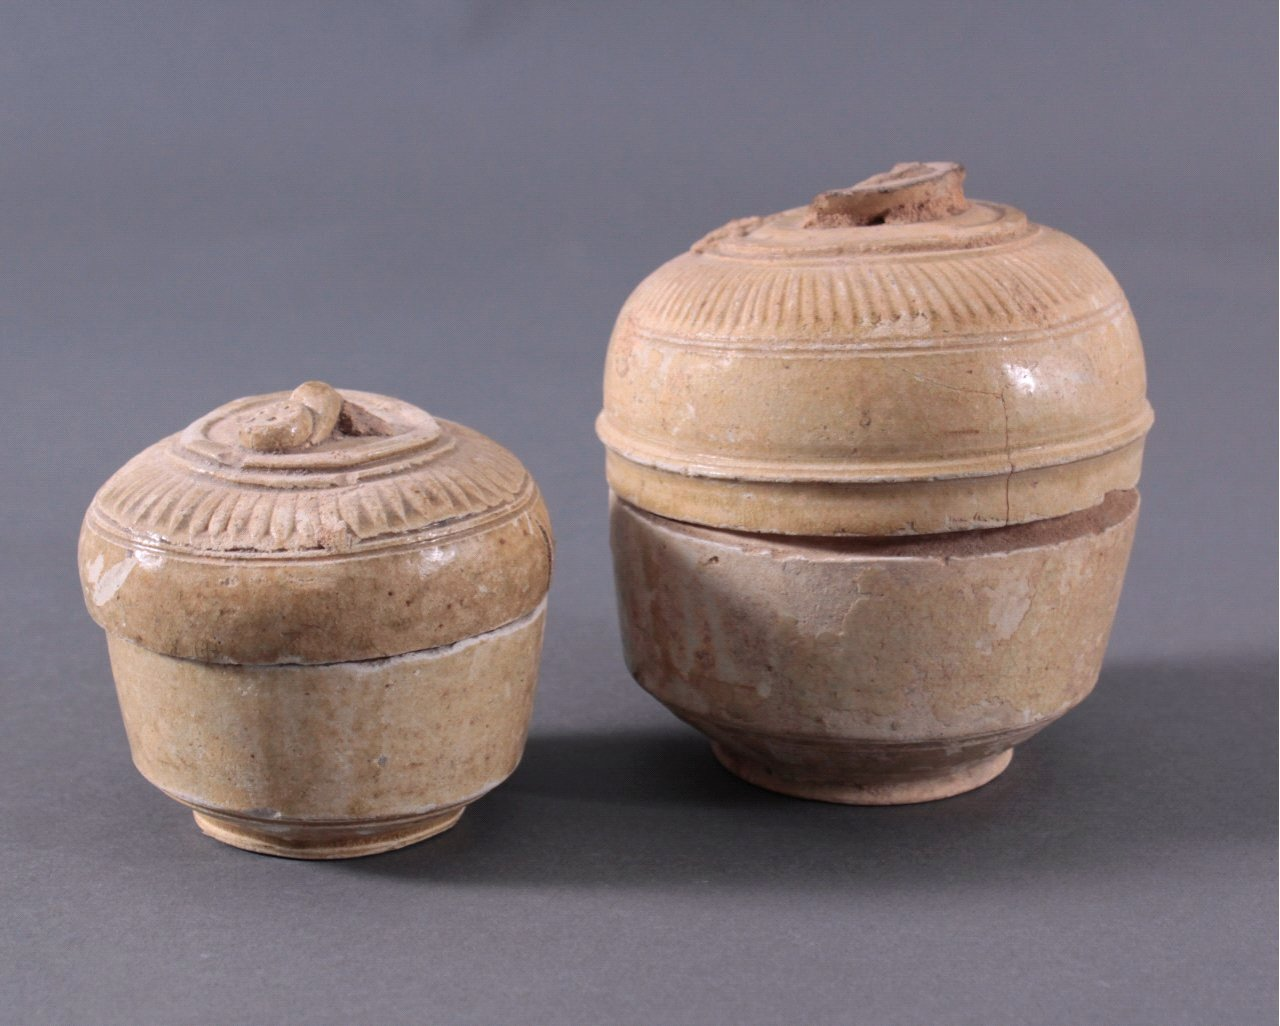 2 Deckelgefäße, Angkor-Periode 12./13. Jahrhundert